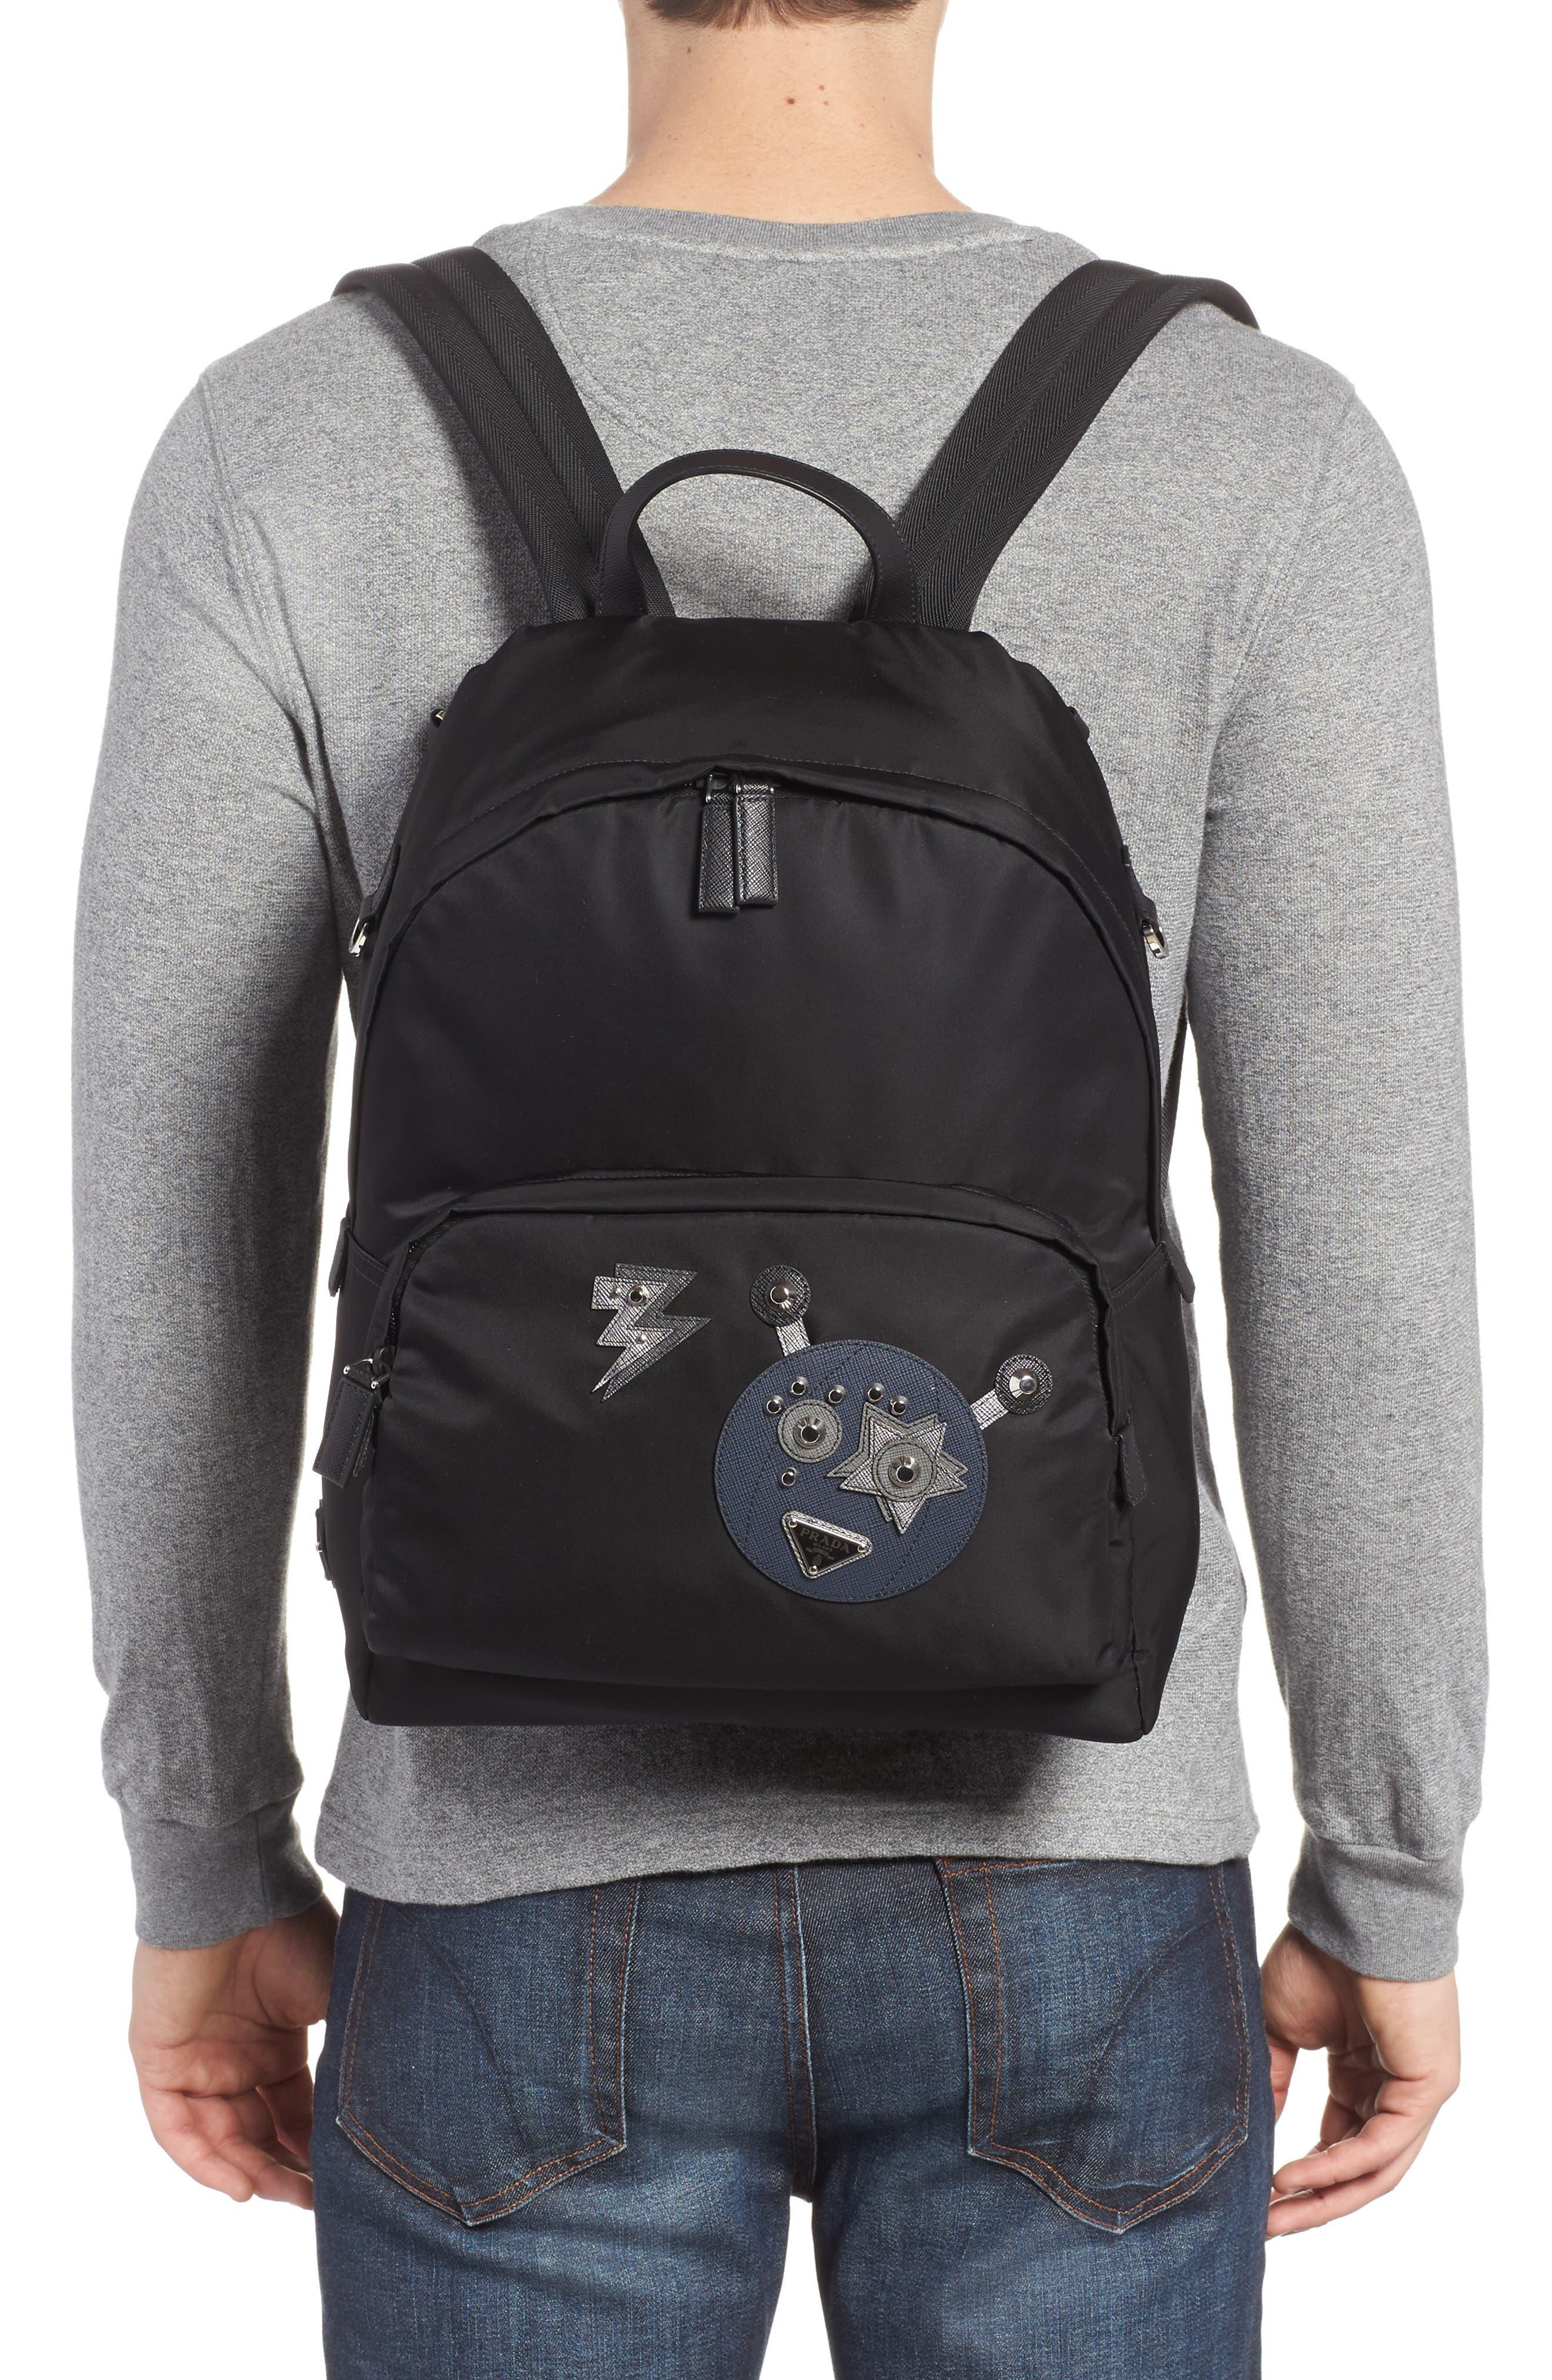 Robot Backpack,                             Alternate thumbnail 2, color,                             907